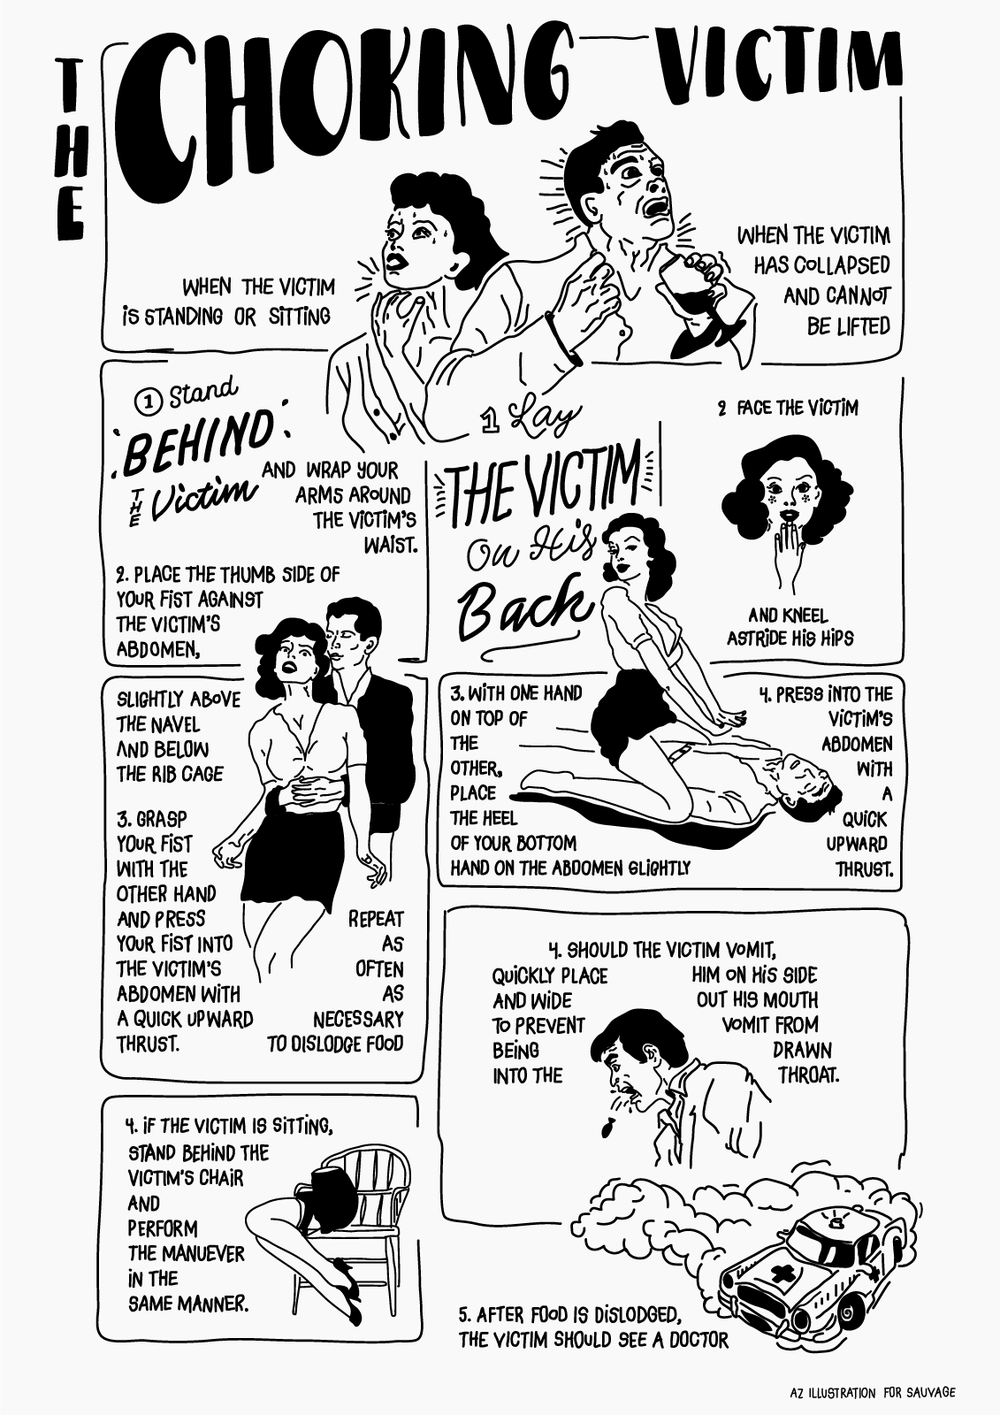 Choking Victim Poster